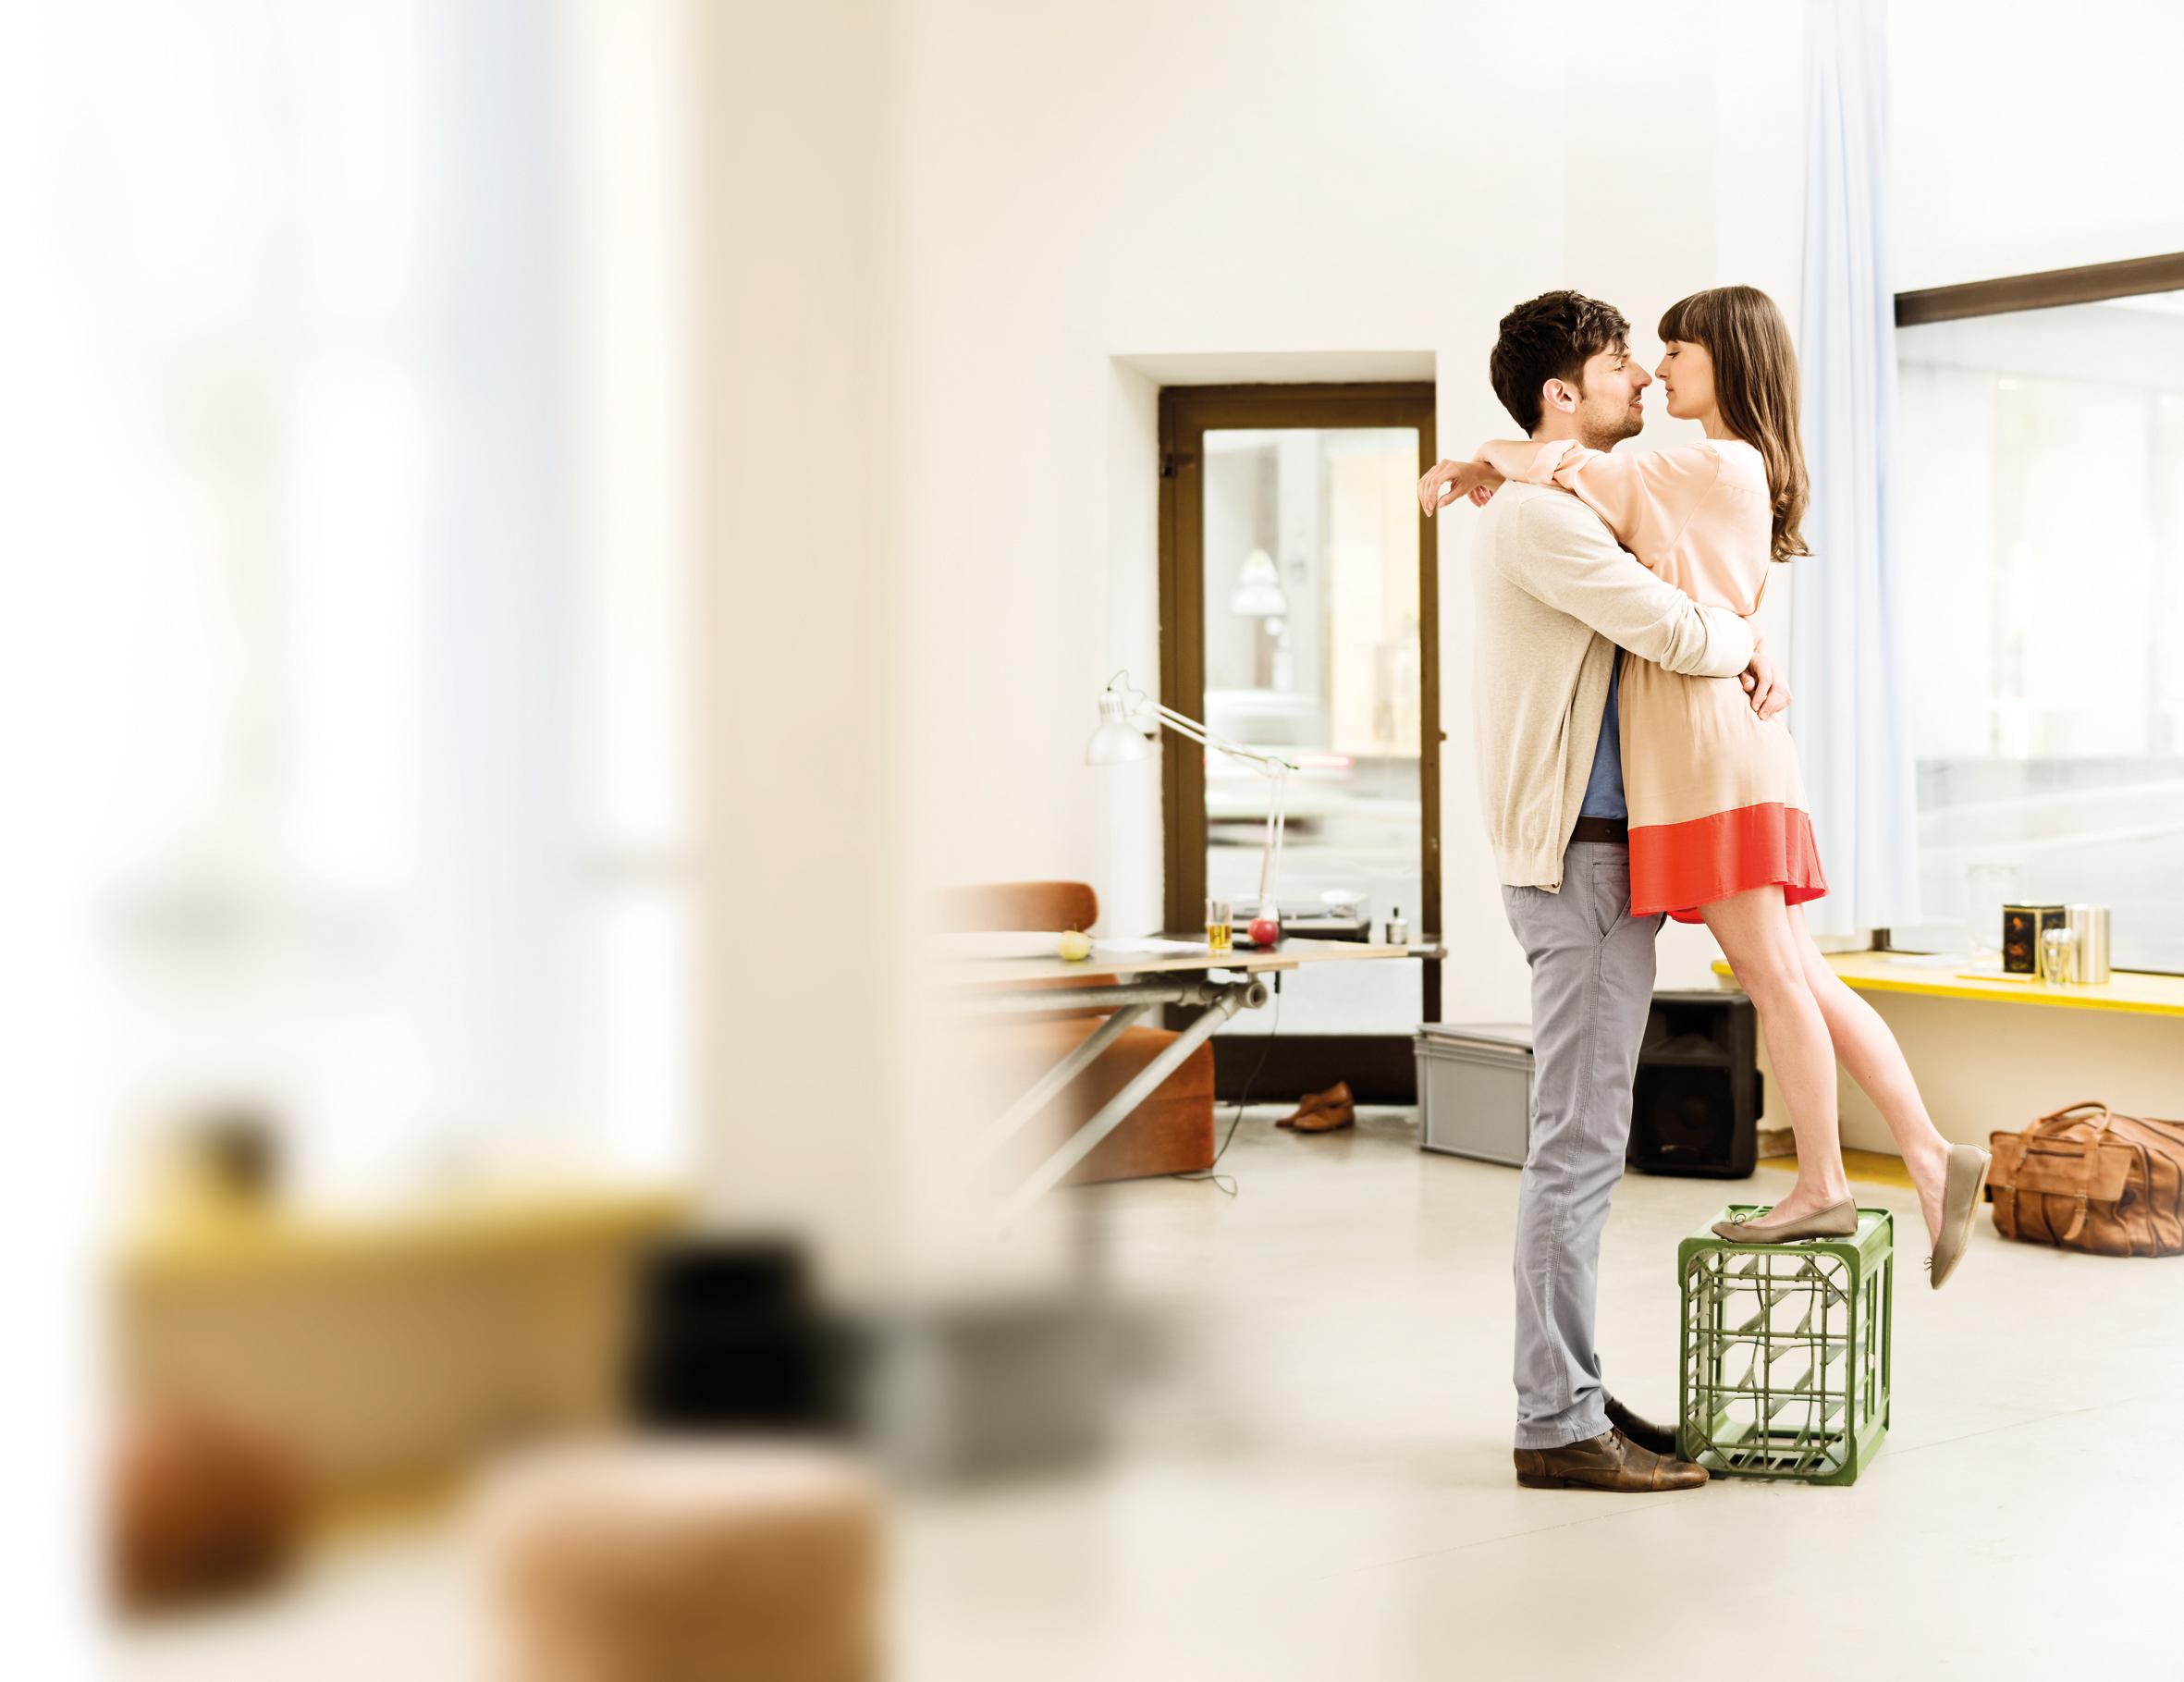 Mladi par se grli u dnevnoj sobi